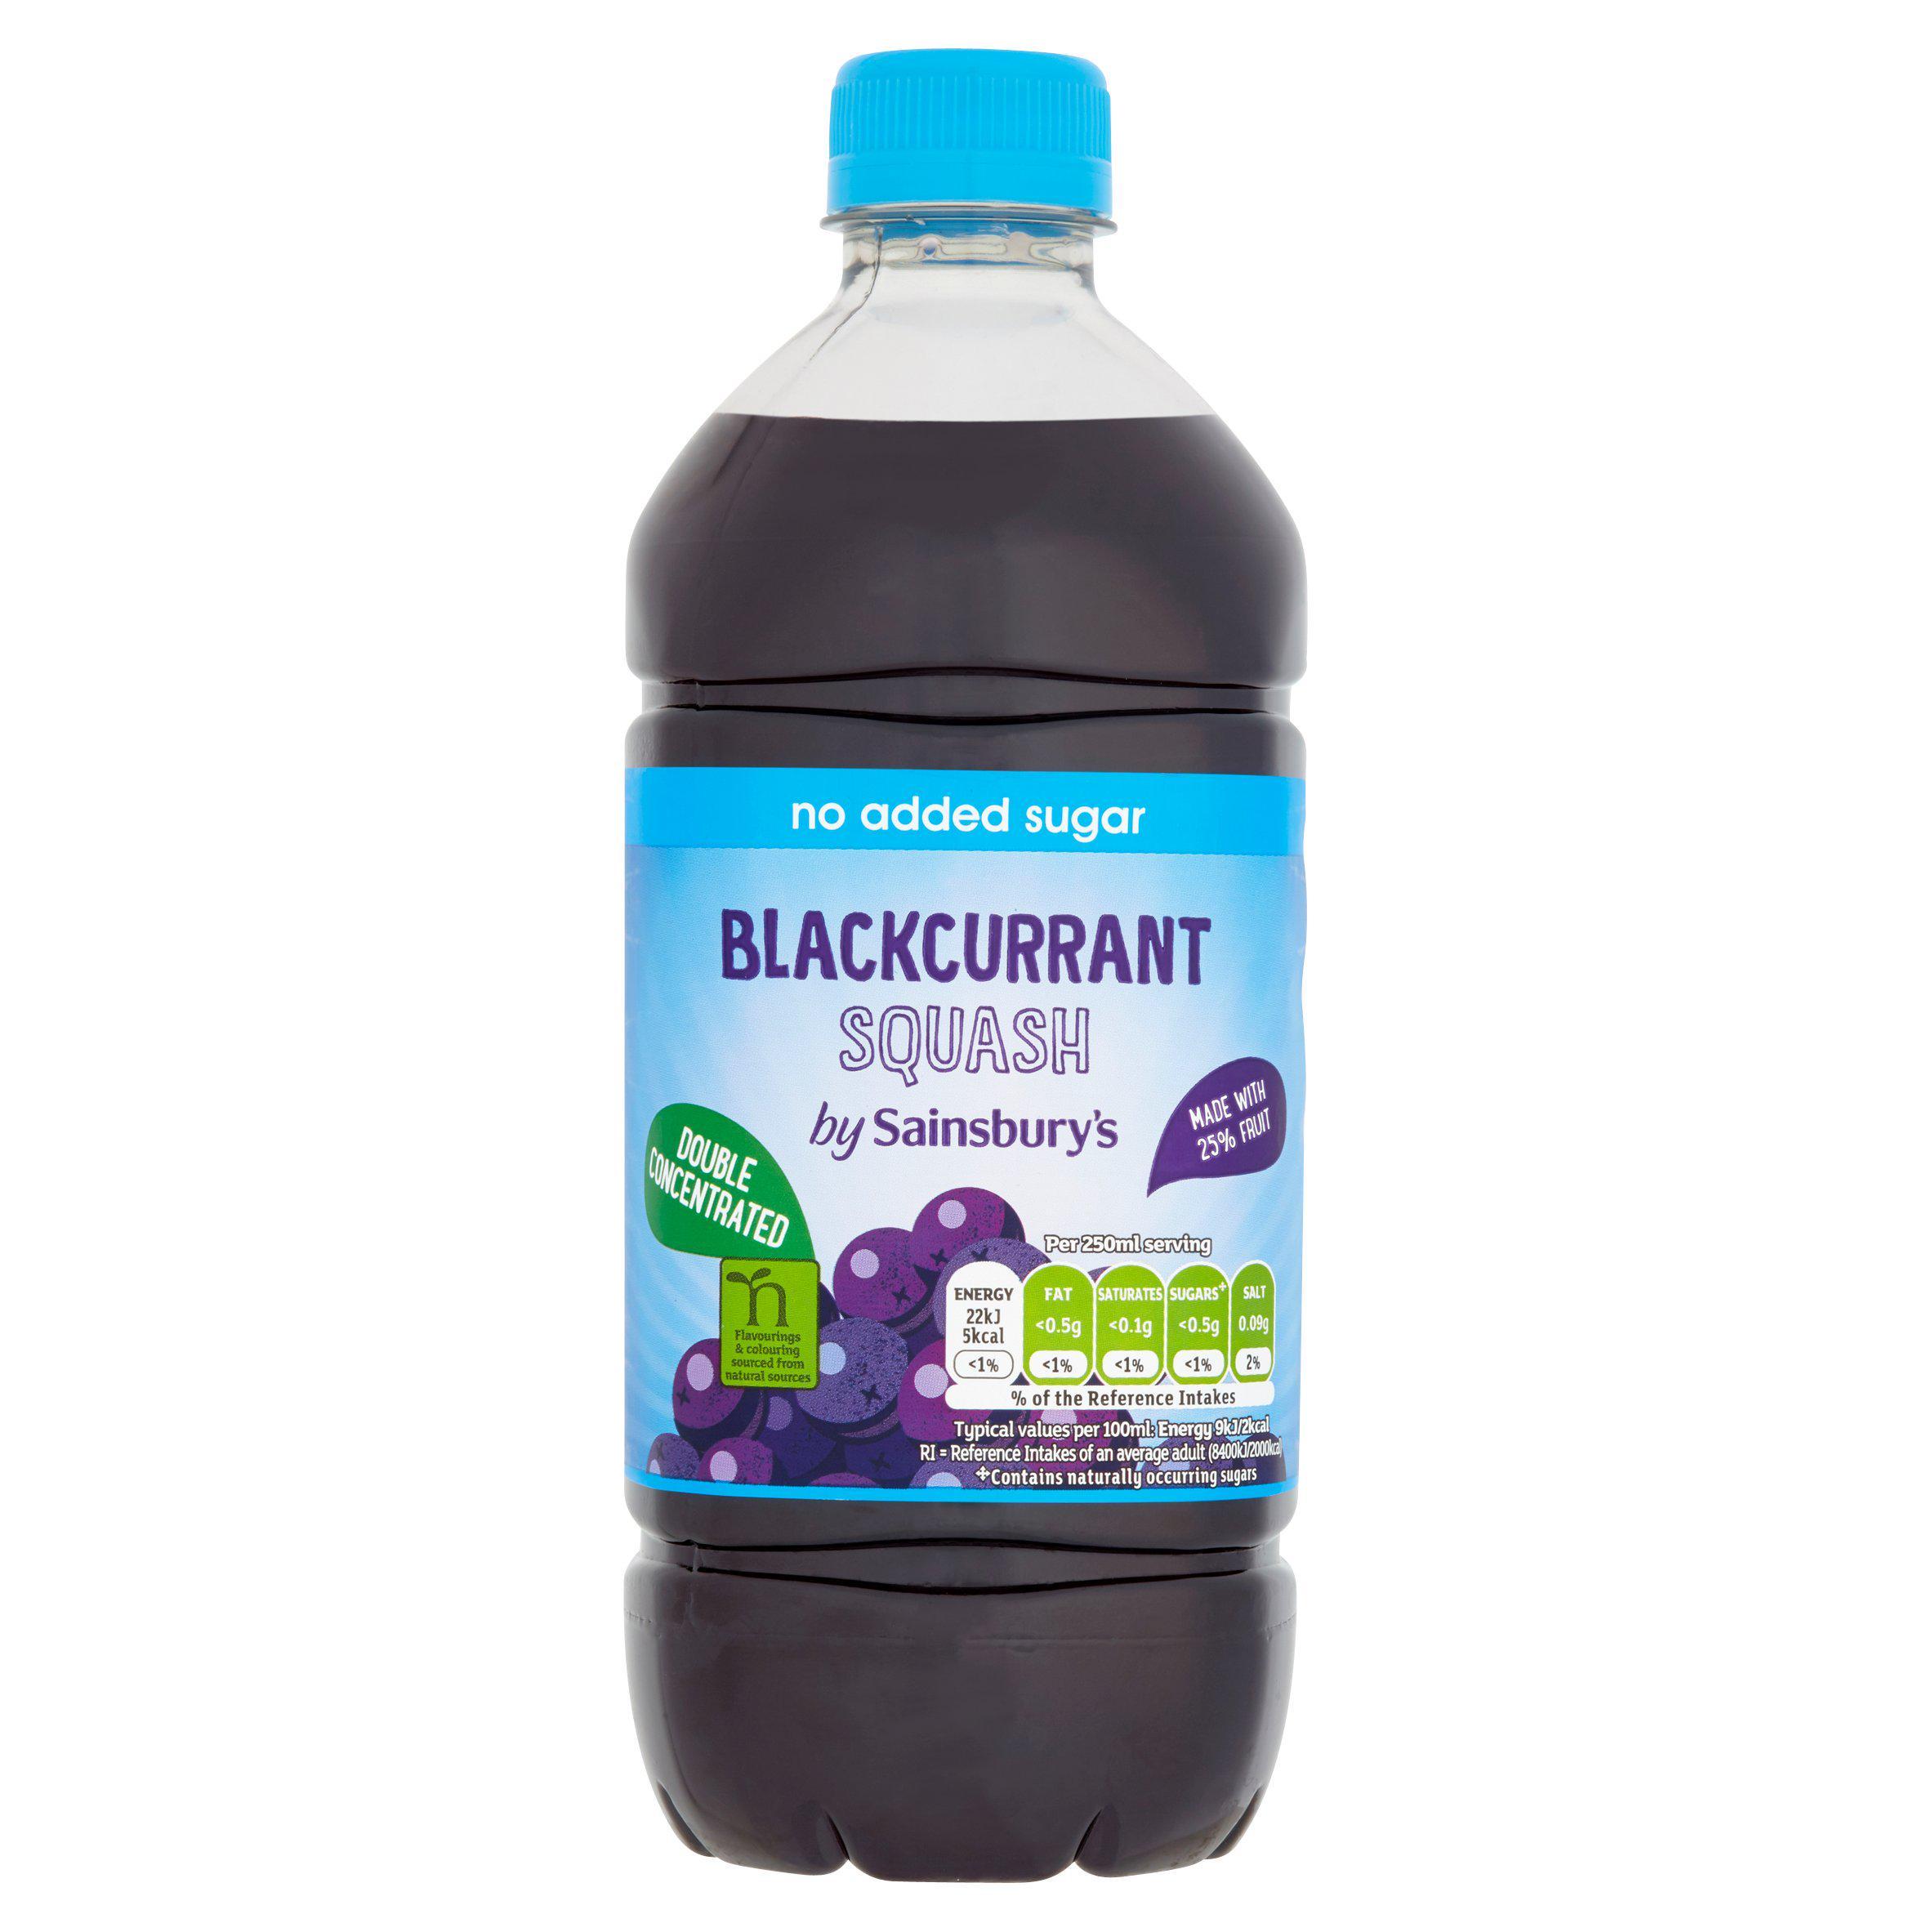 Sainsbury's Double Strength Blackcurrant Squash 750ml, No Added Sugar 43p @ Sainsbury's Cromwell Rd London